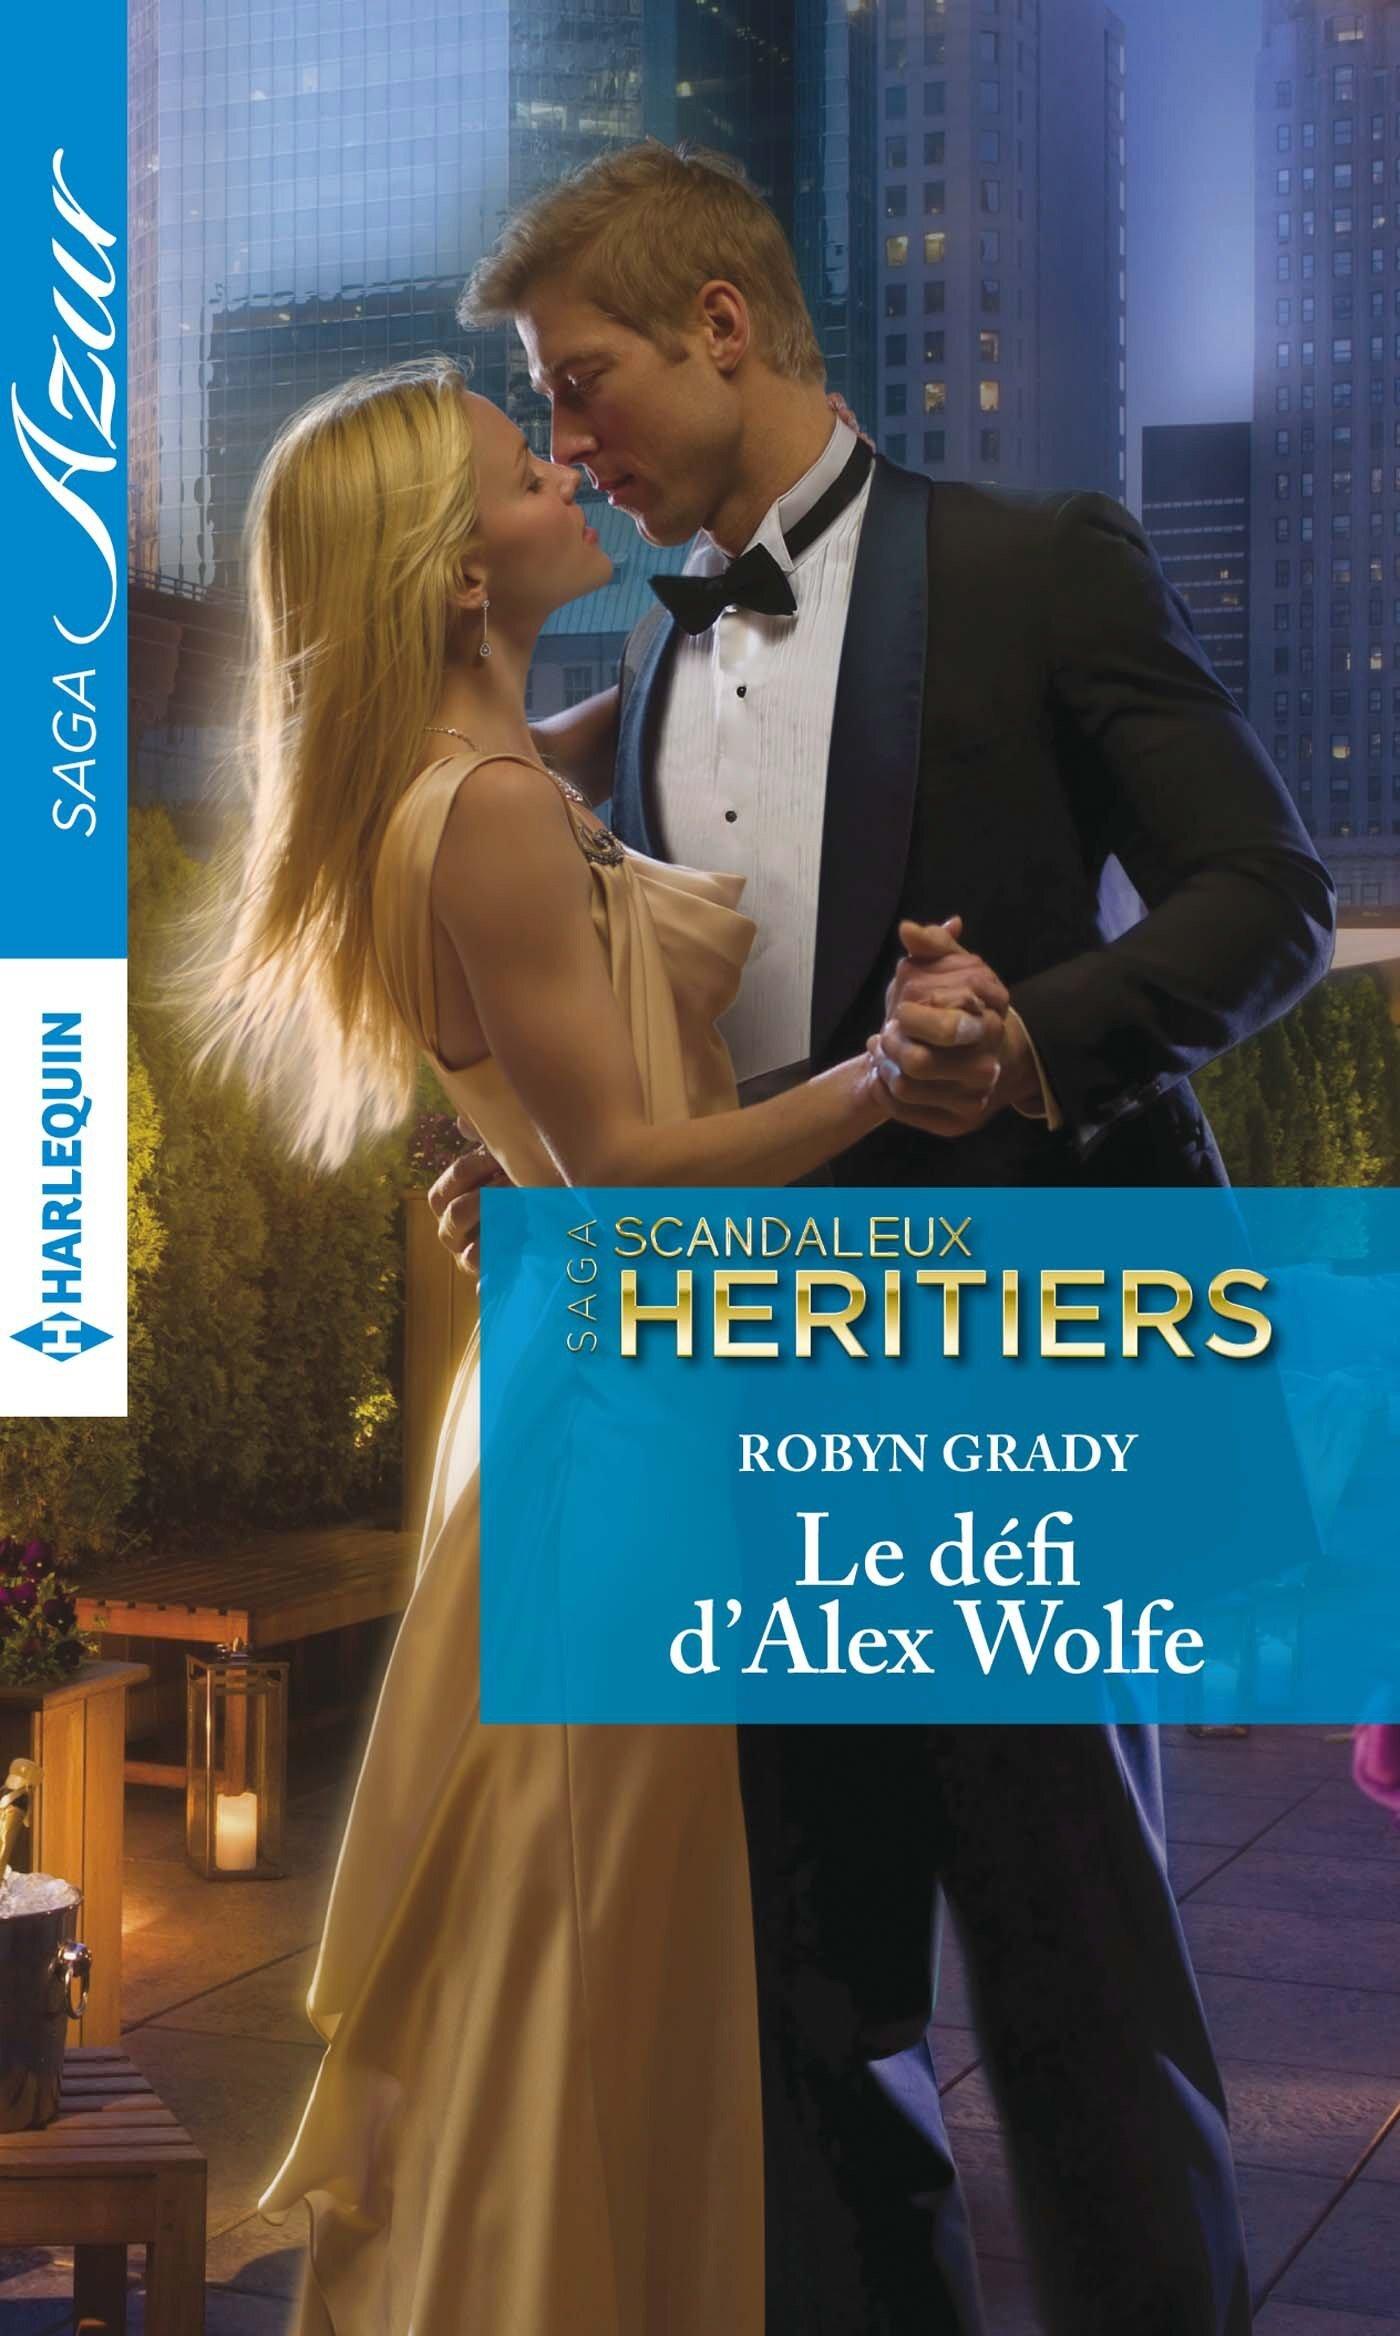 cdn1.booknode.com/book_cover/1232/full/scandaleux-heritiers-tome-4-le-defi-d-alex-wolfe-1231899.jpg